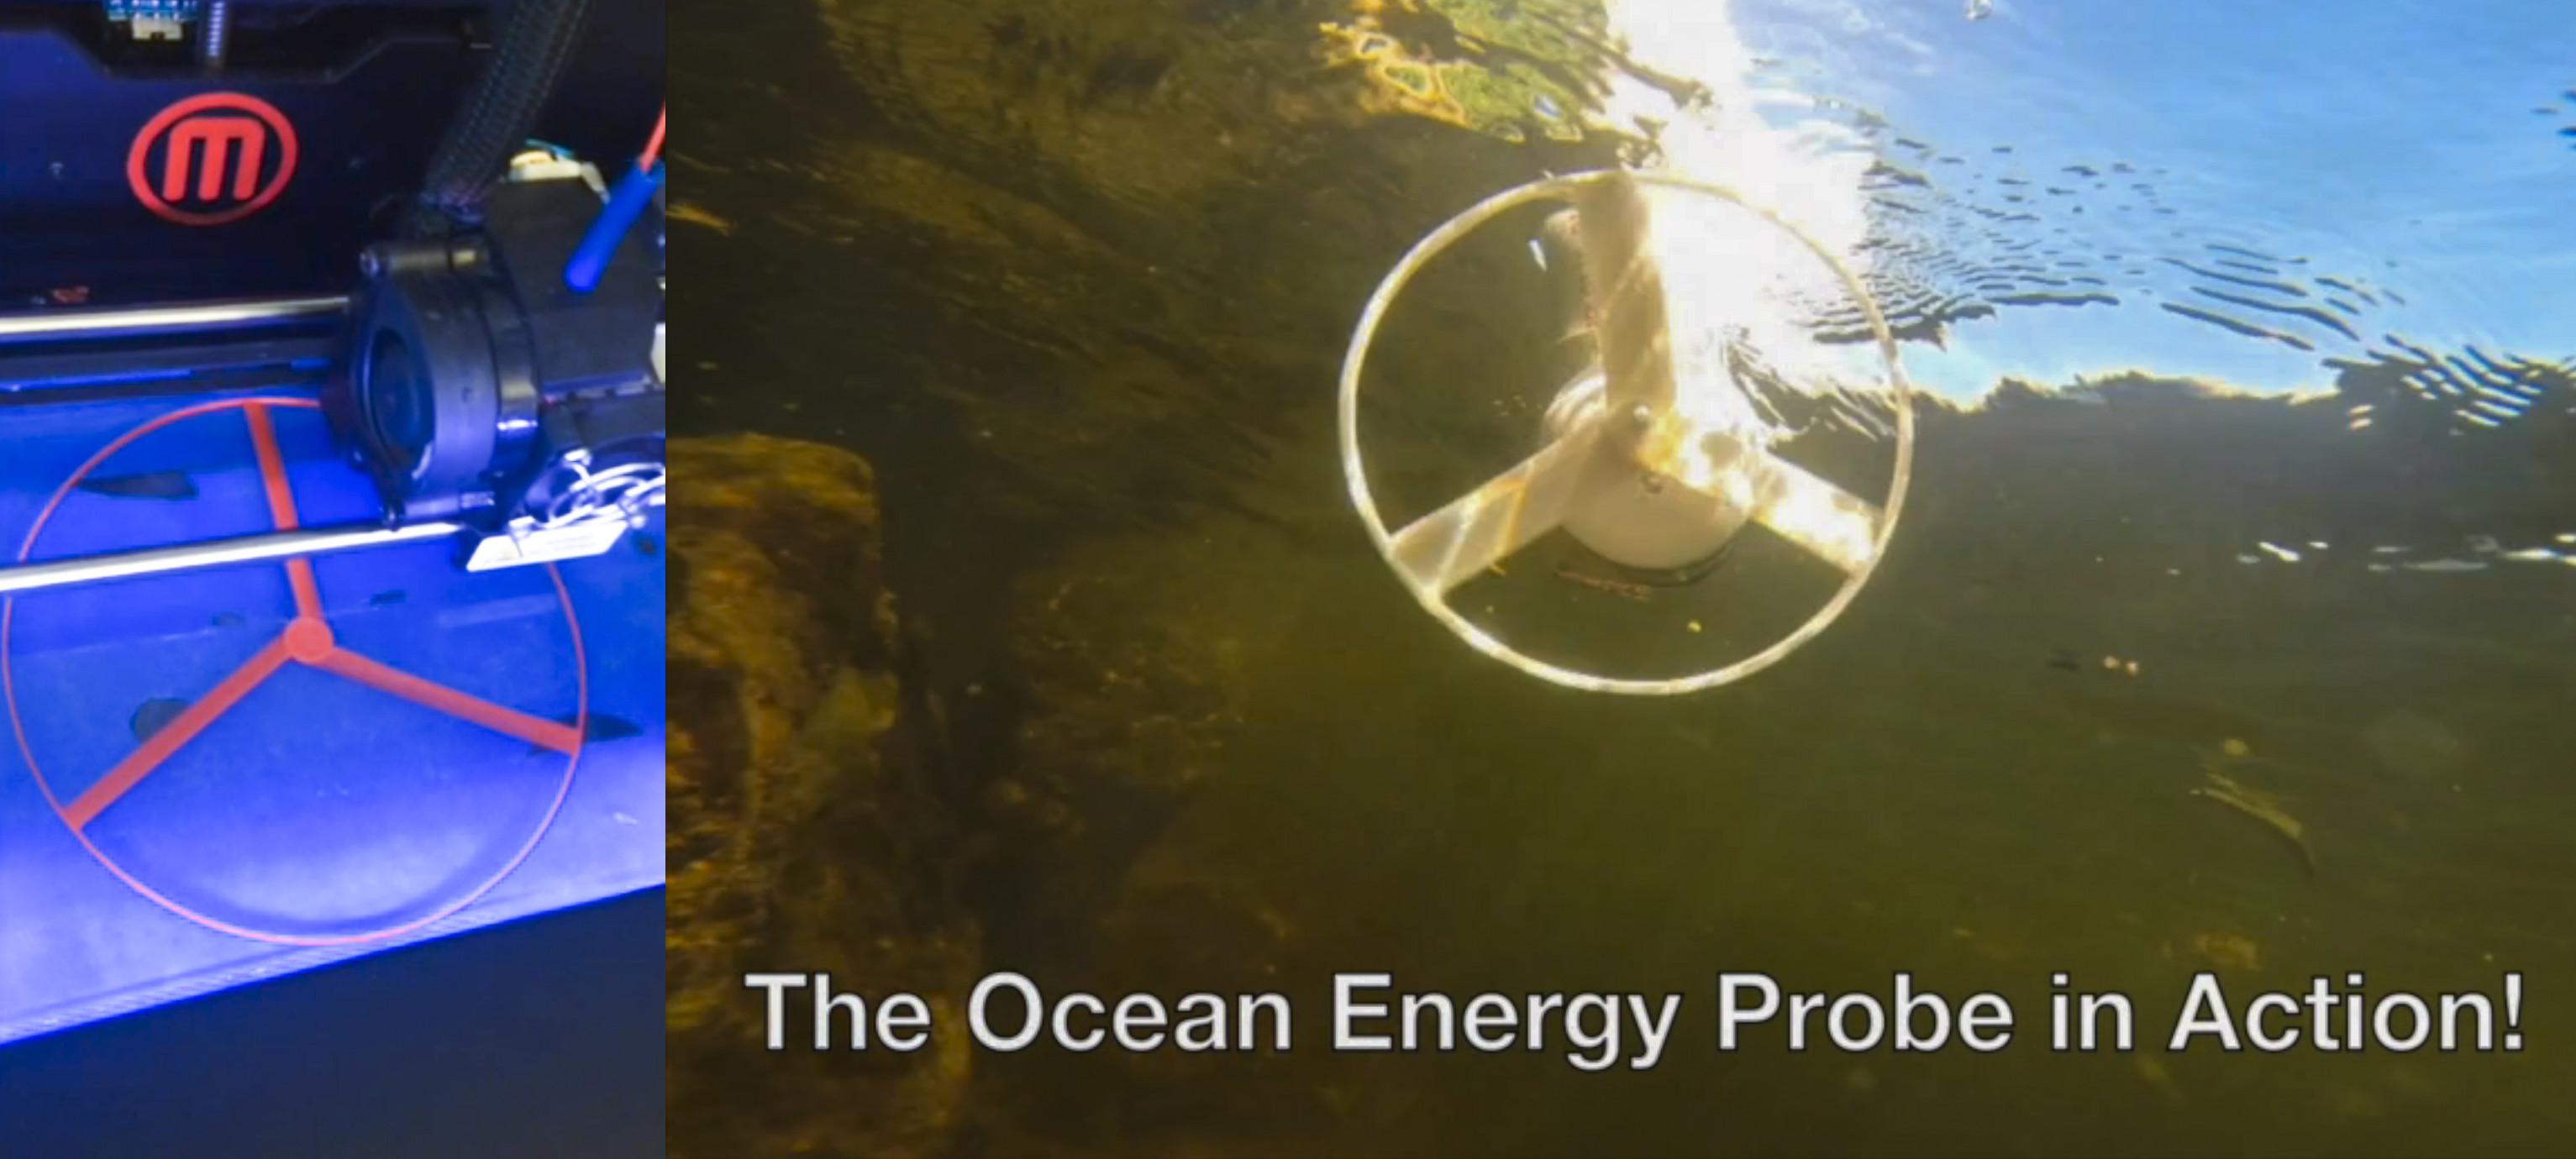 4_renewable energy from ocean currents